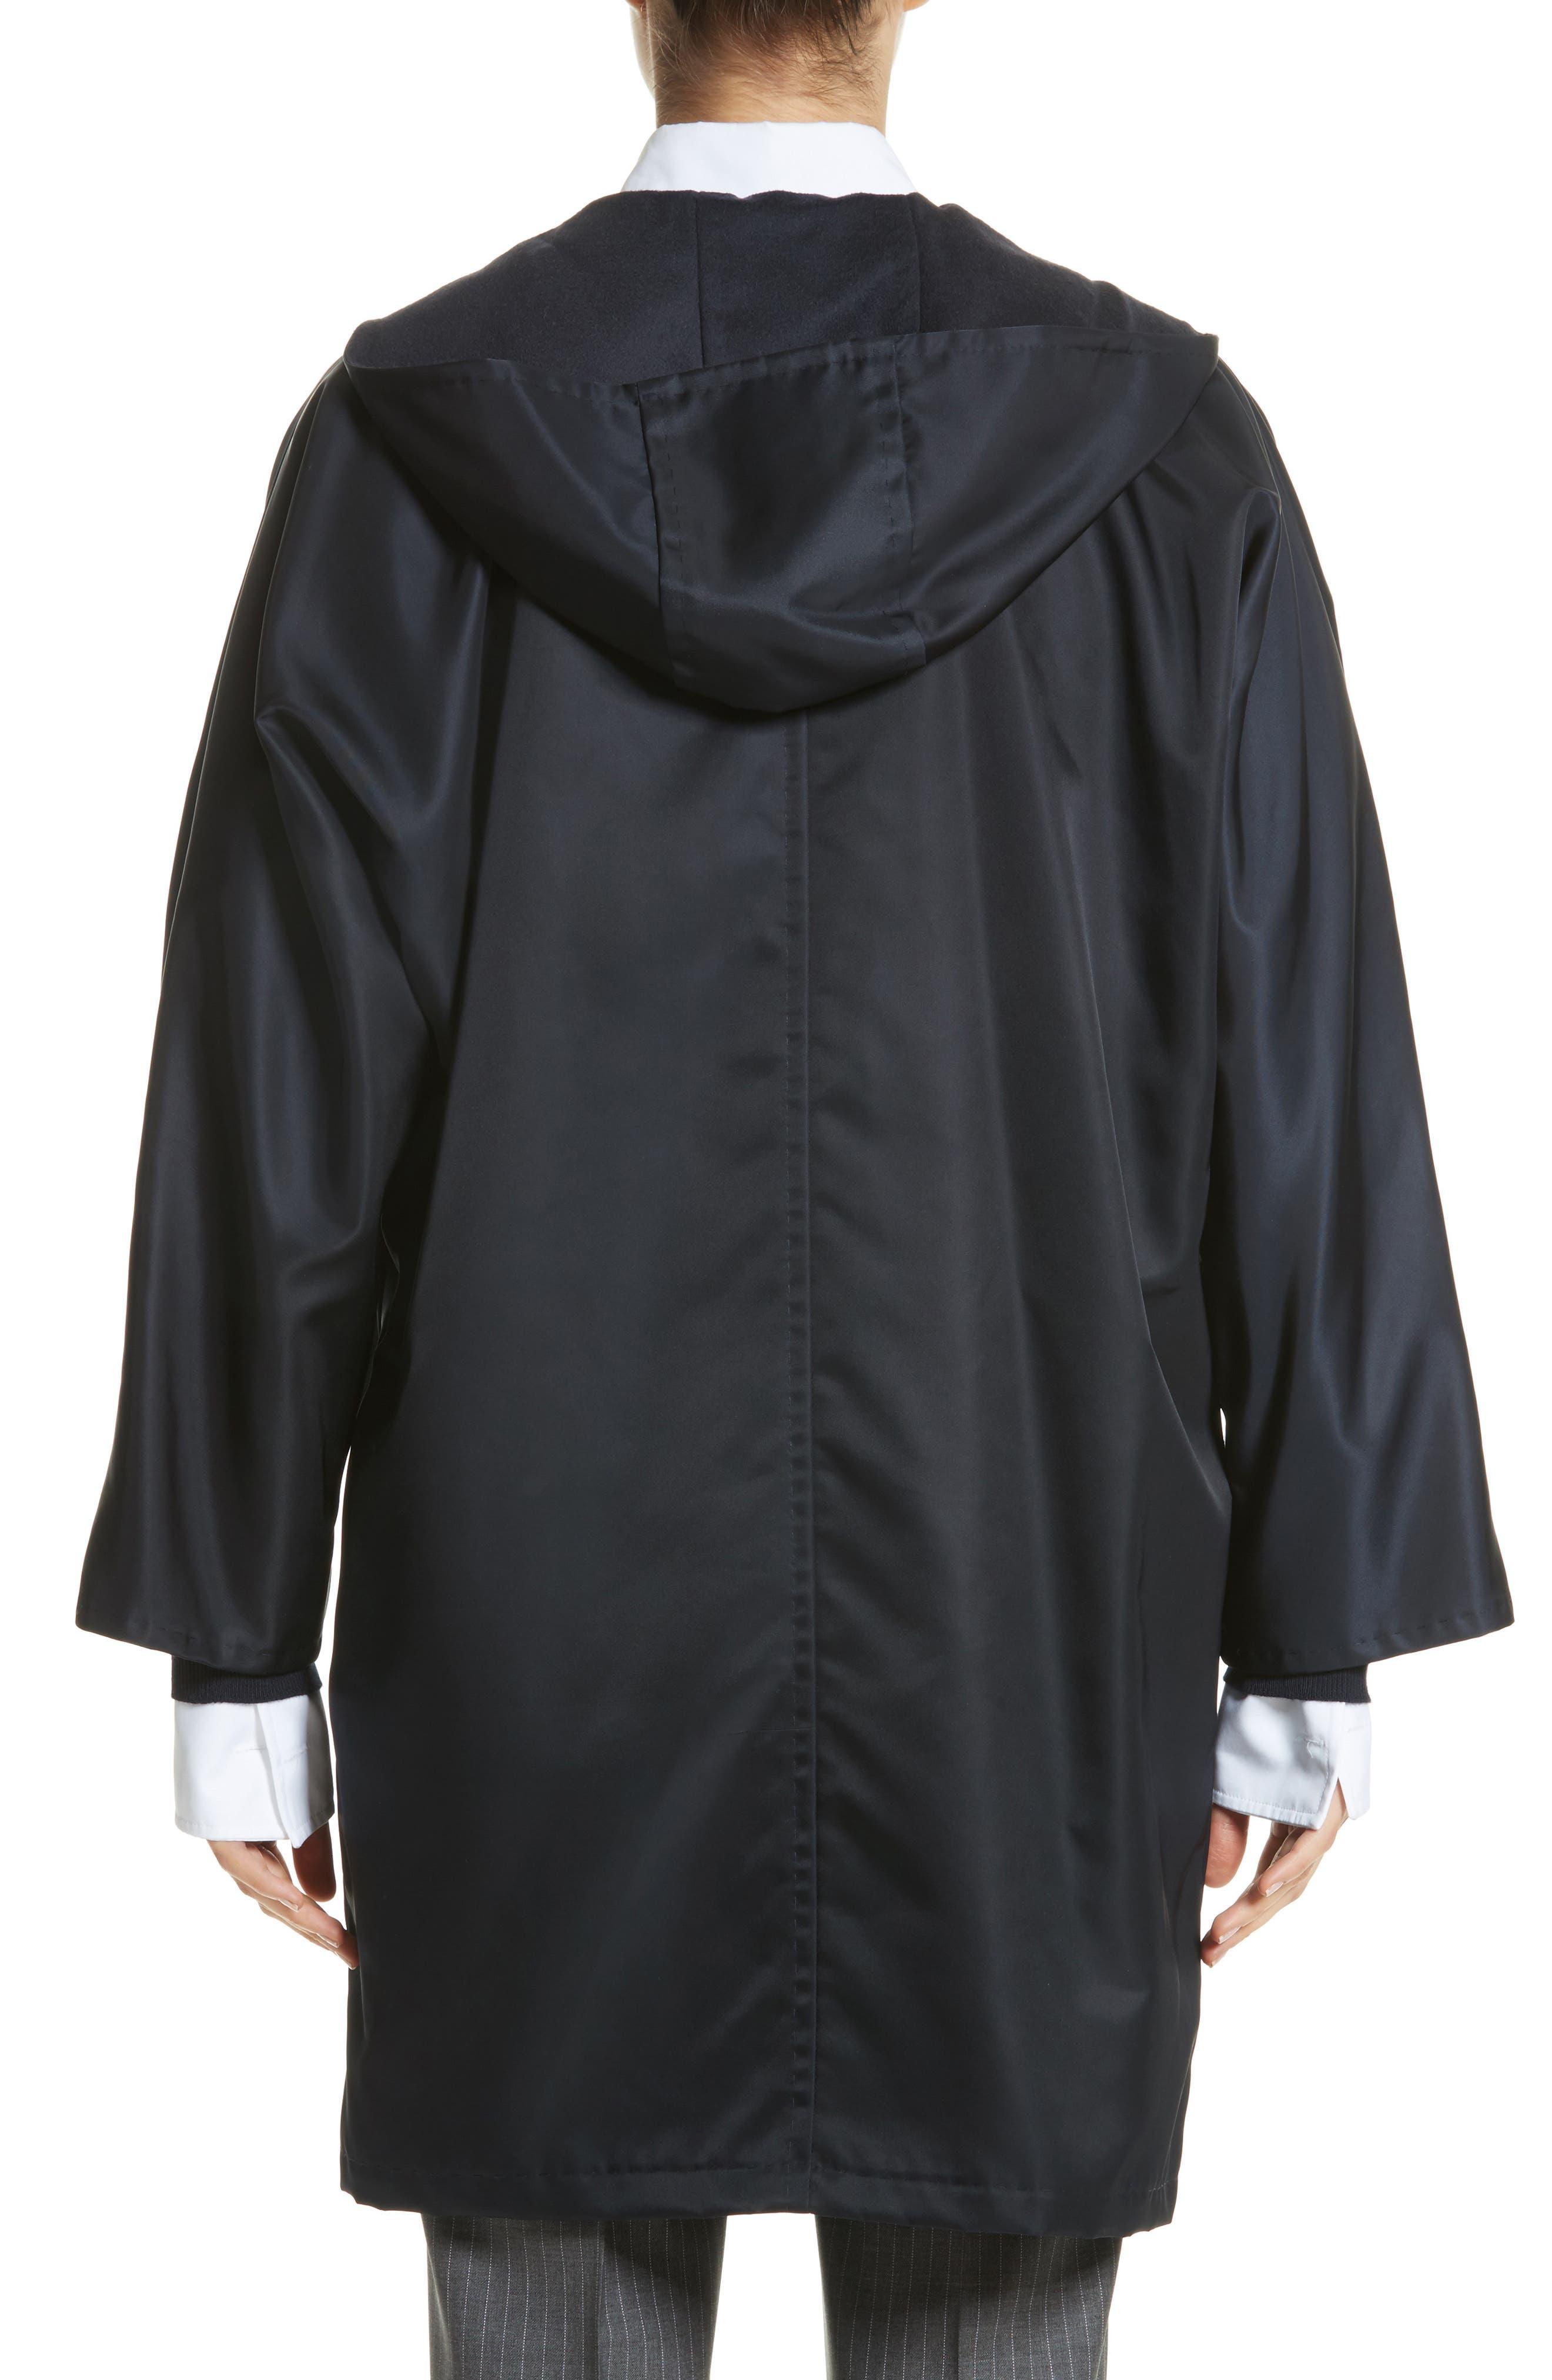 Jacopo Reversible Hooded Coat,                             Alternate thumbnail 3, color,                             411